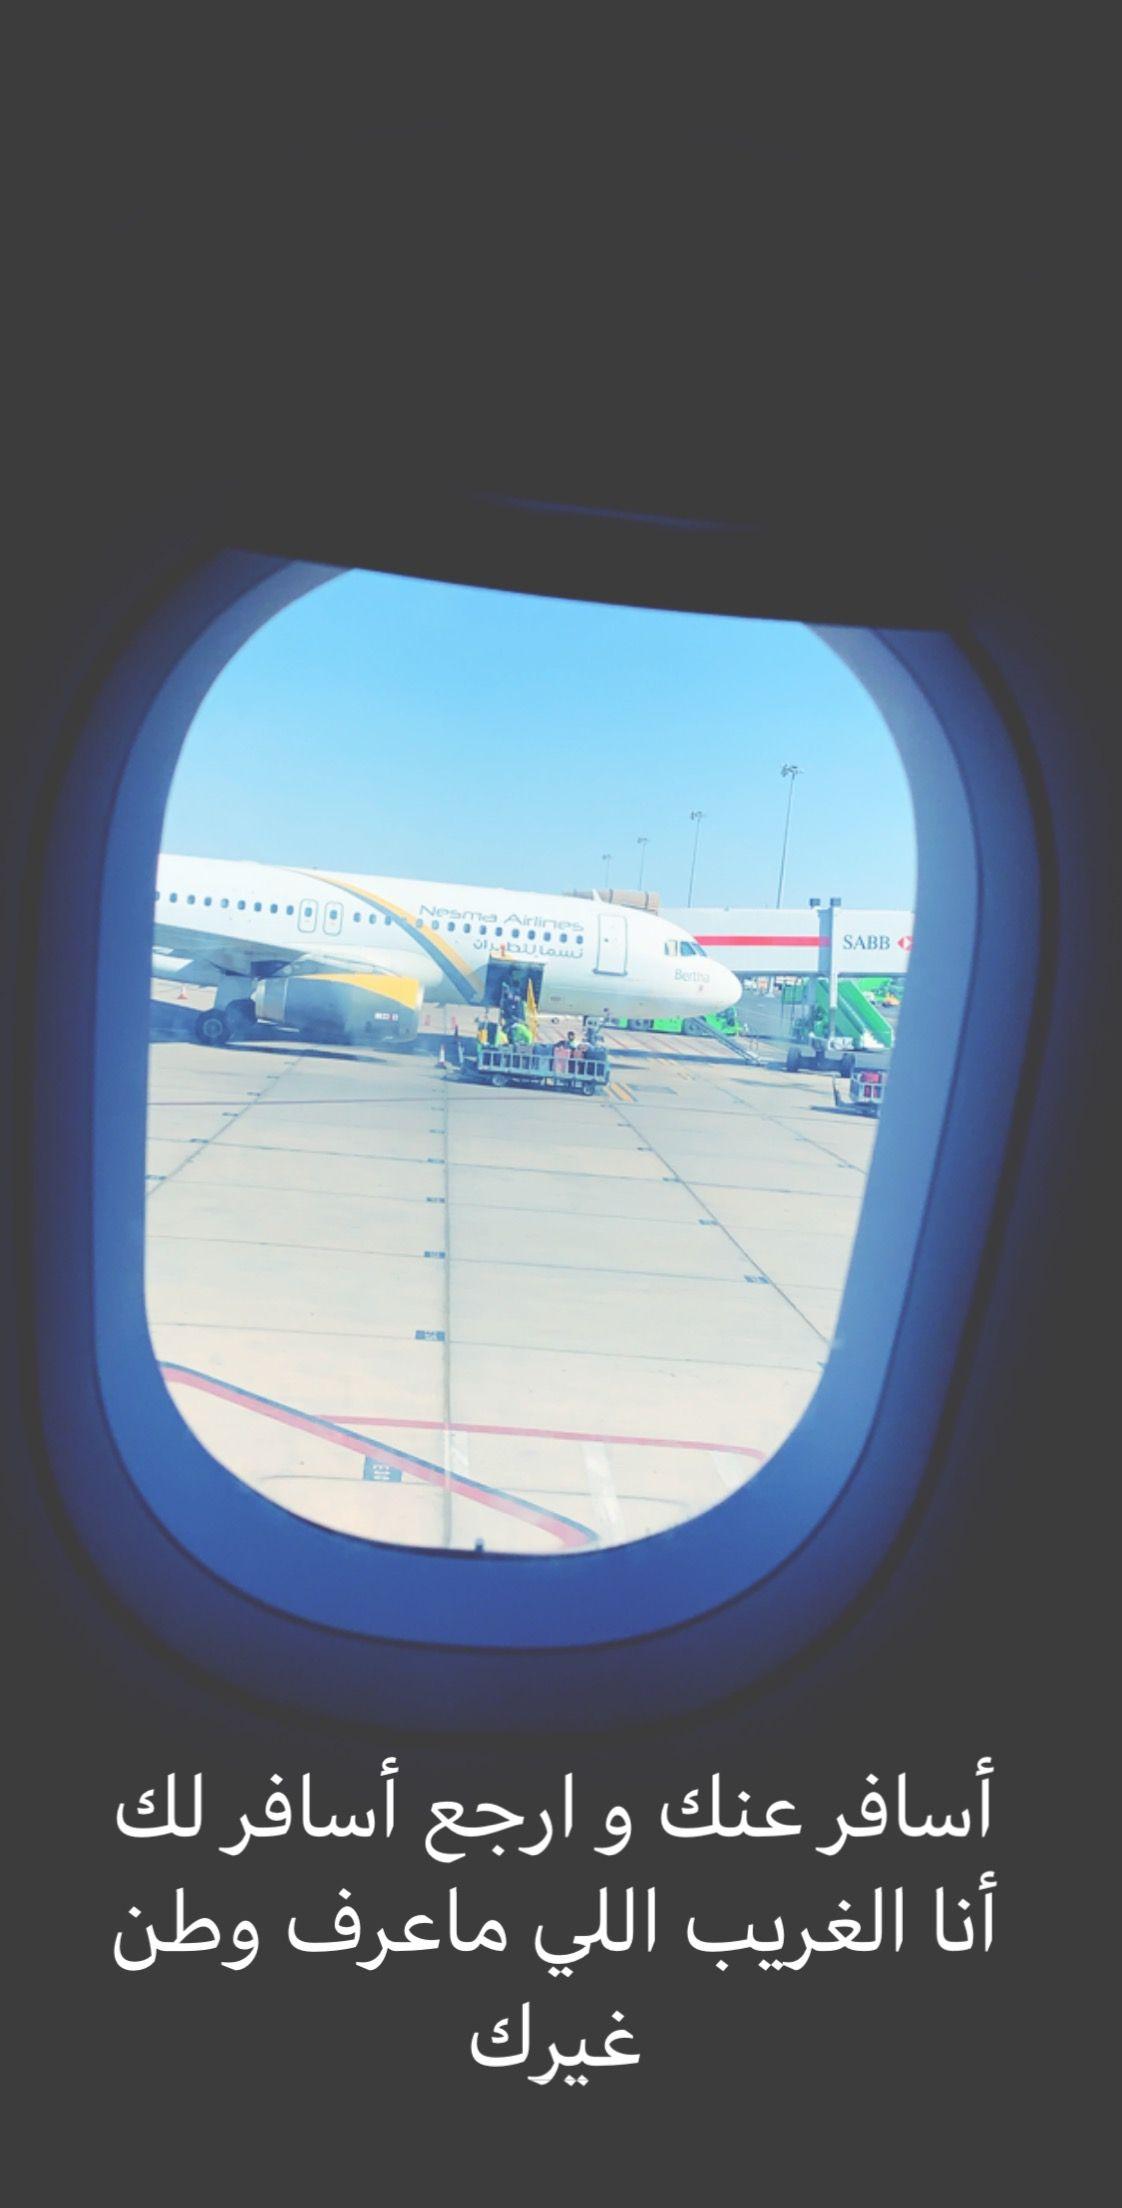 Pin By Sami On حب خواطر بوح سفر تصوير سناب Airplane View Scenes Views